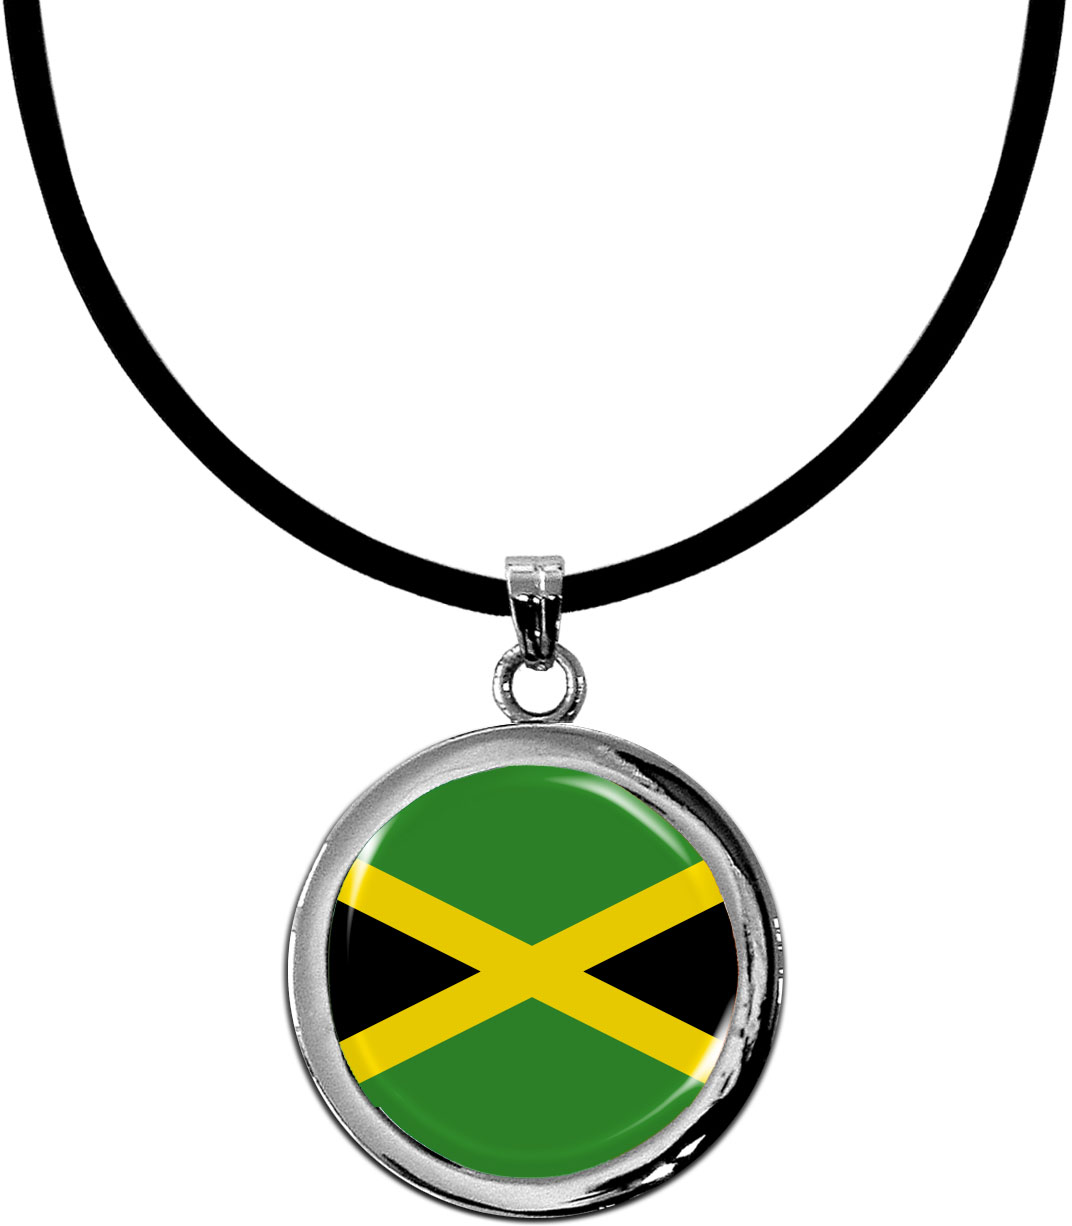 Kettenanhänger / Jamaika / Silikonband mit Silberverschluss